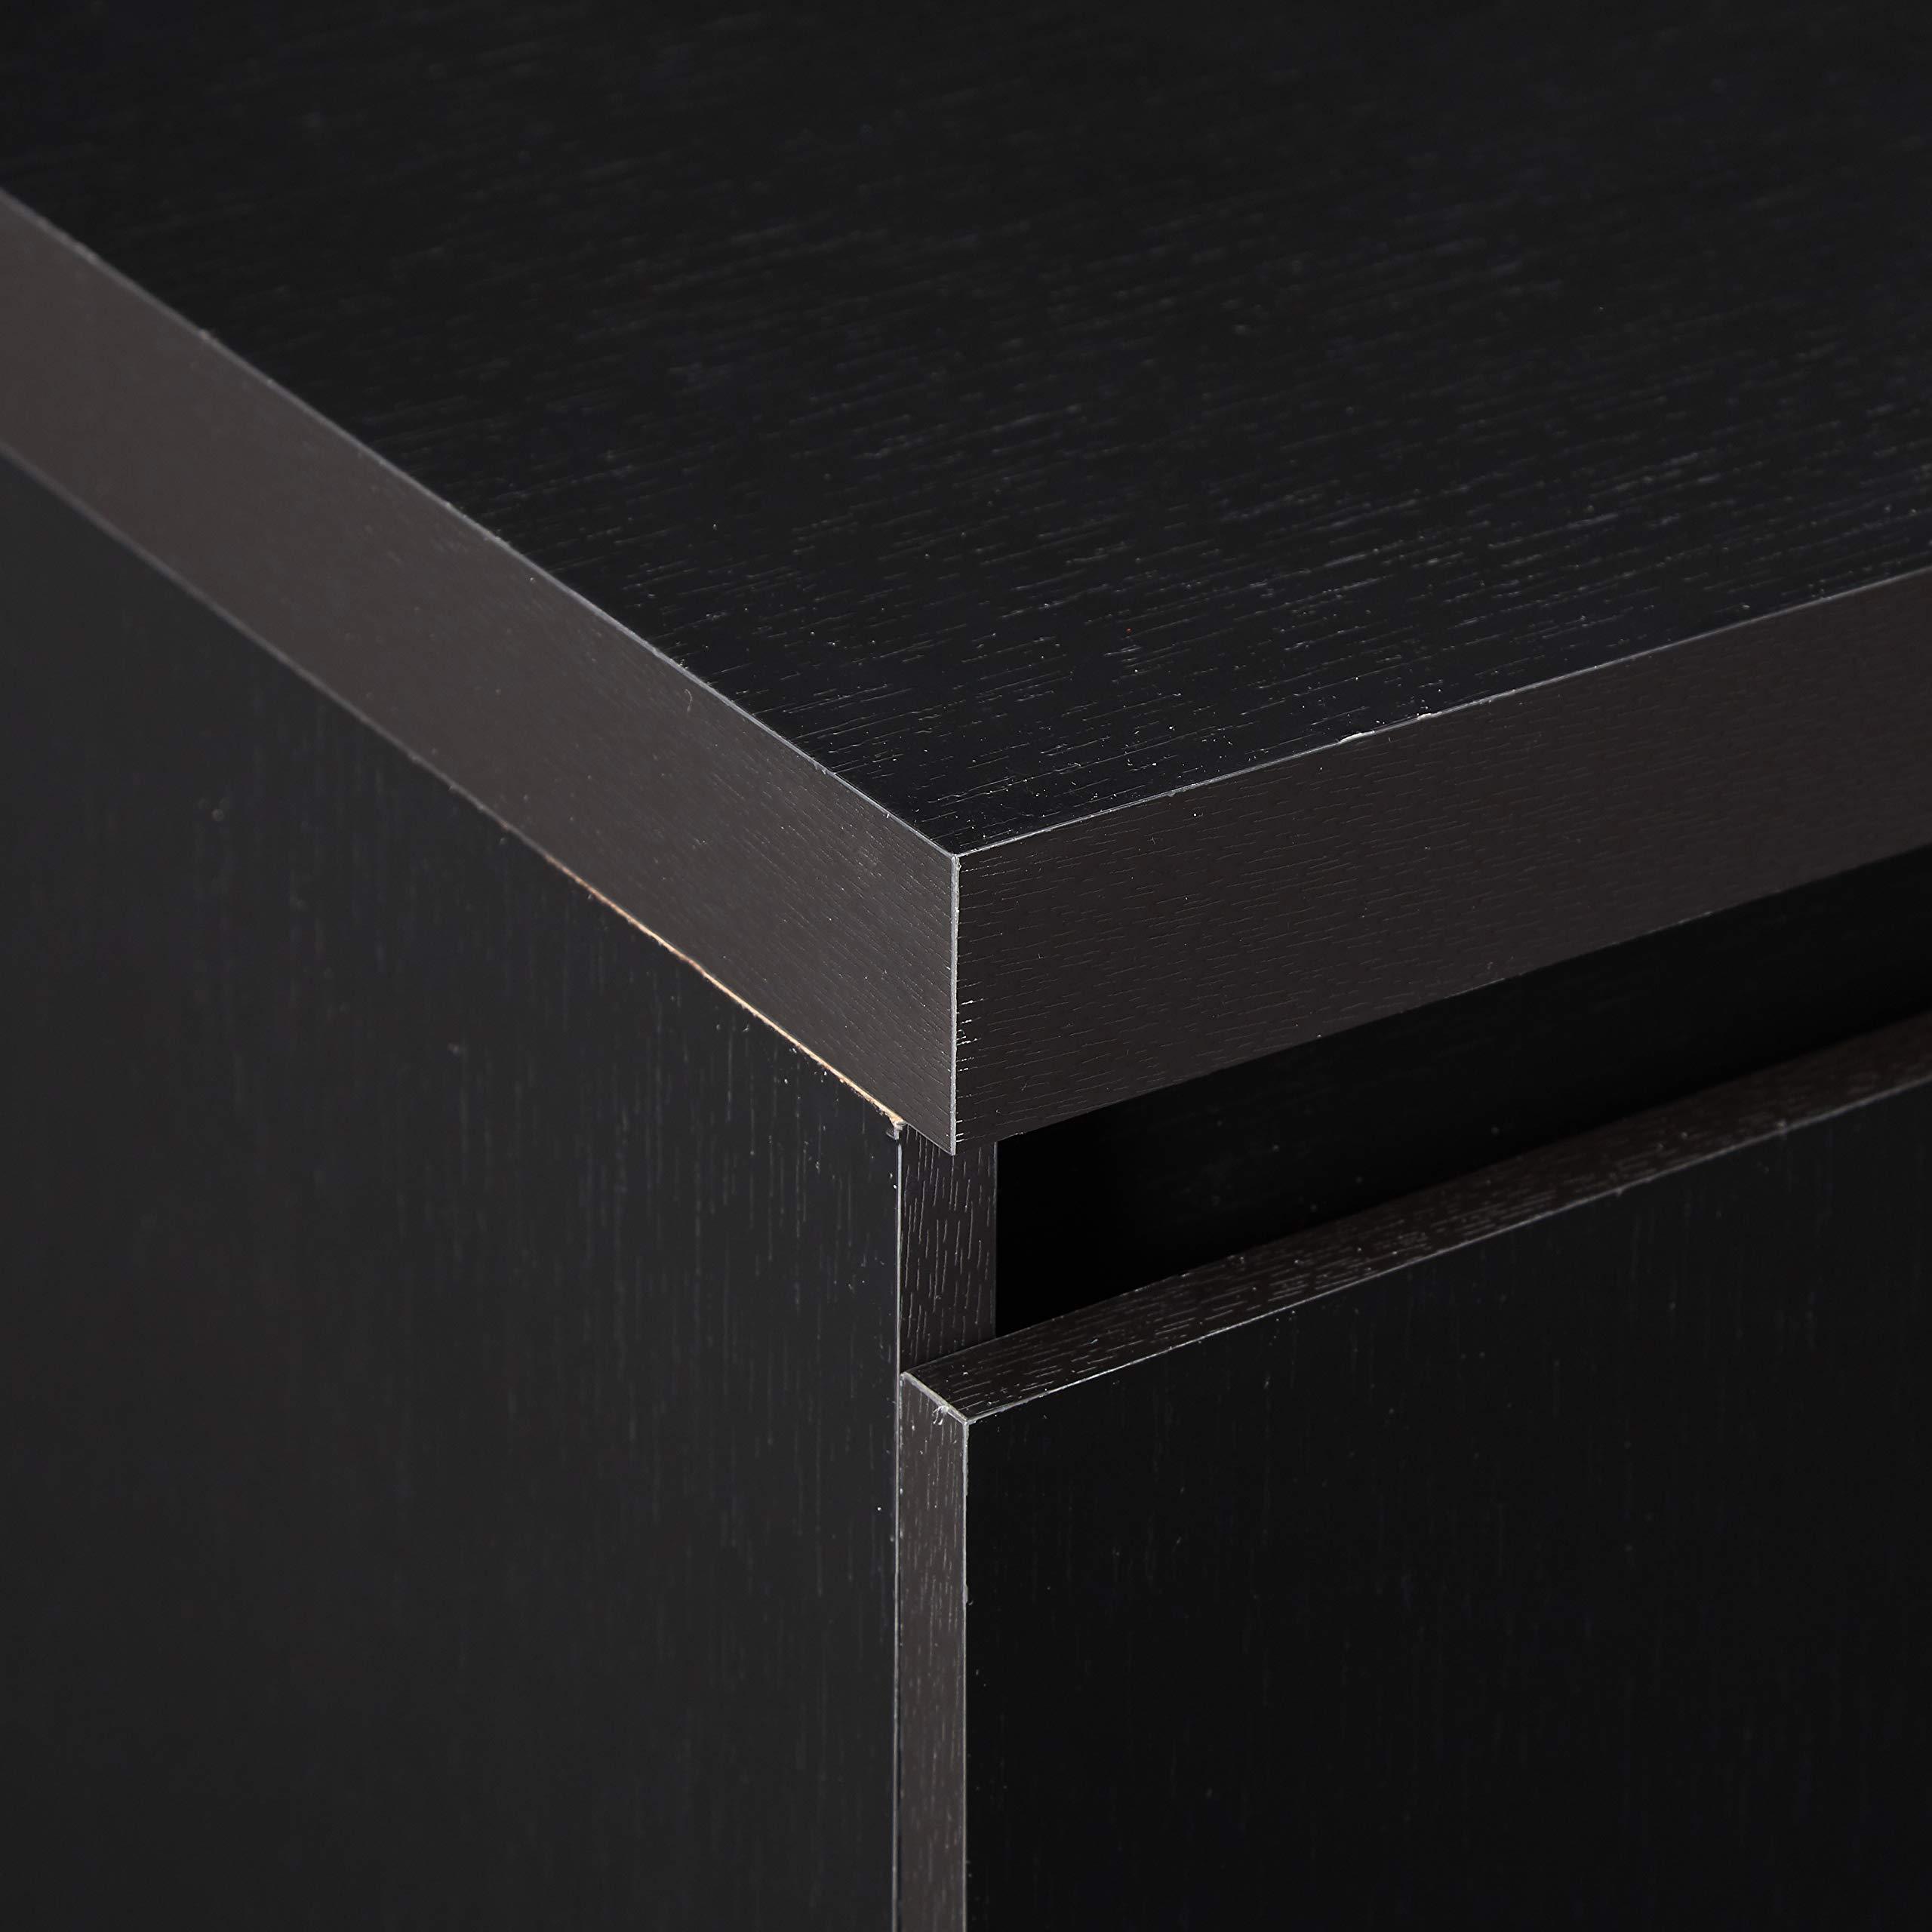 Manhattan Comforts 100653-MC Viennese Sideboard Black Matte by Manhattan Comforts (Image #4)